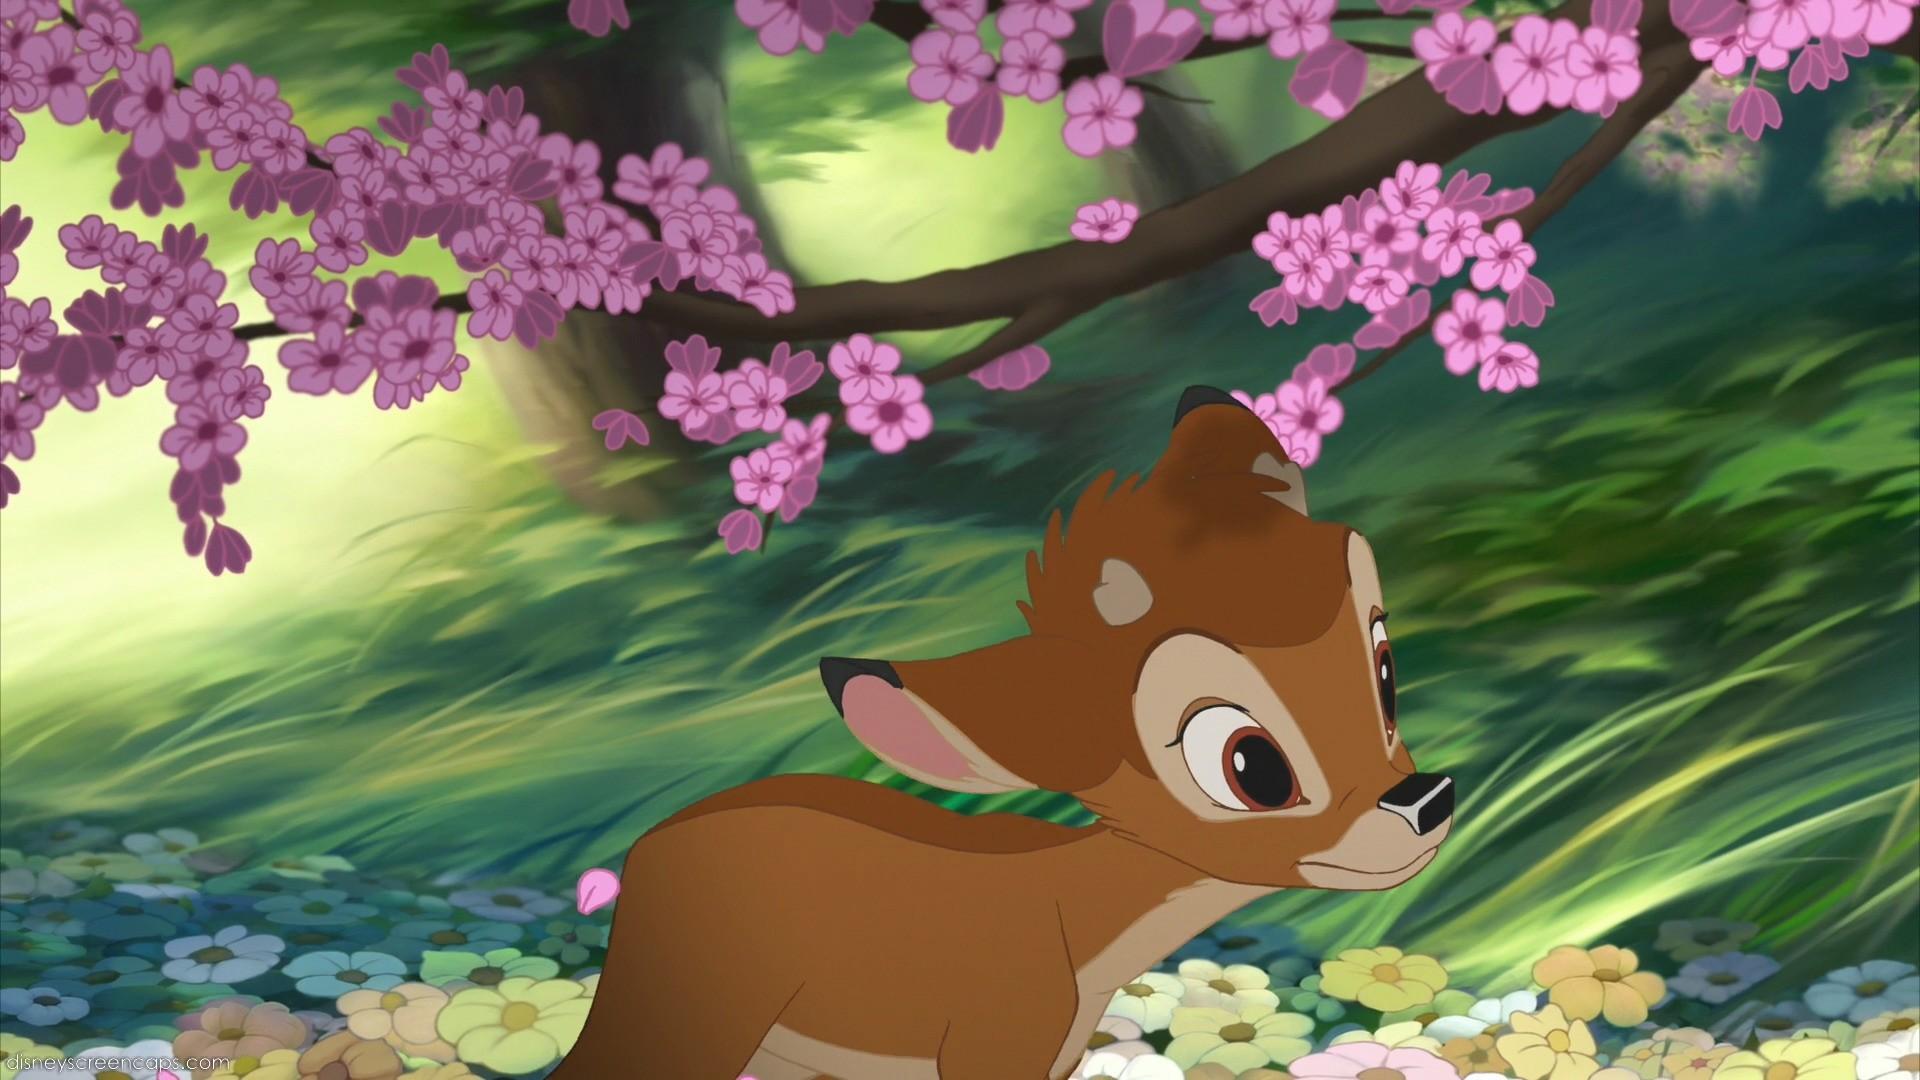 Res: 1920x1080, ... Imagenes De Bambi | 100% Quality HD Wallpapers, Photos ...